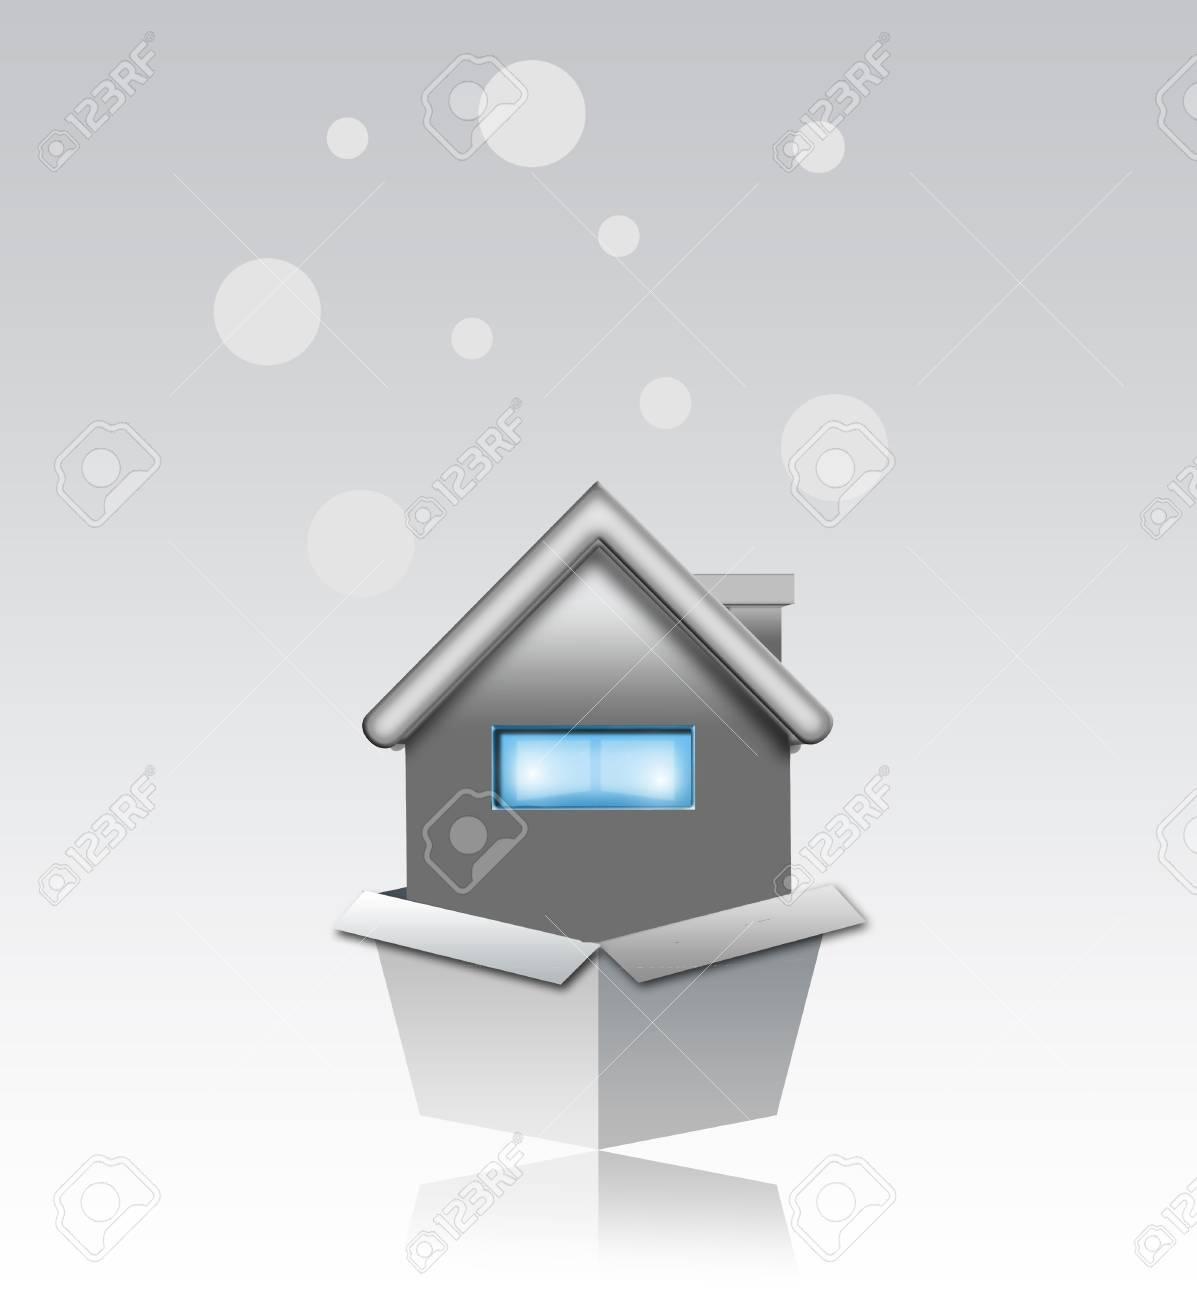 House-gift Stock Photo - 16973471